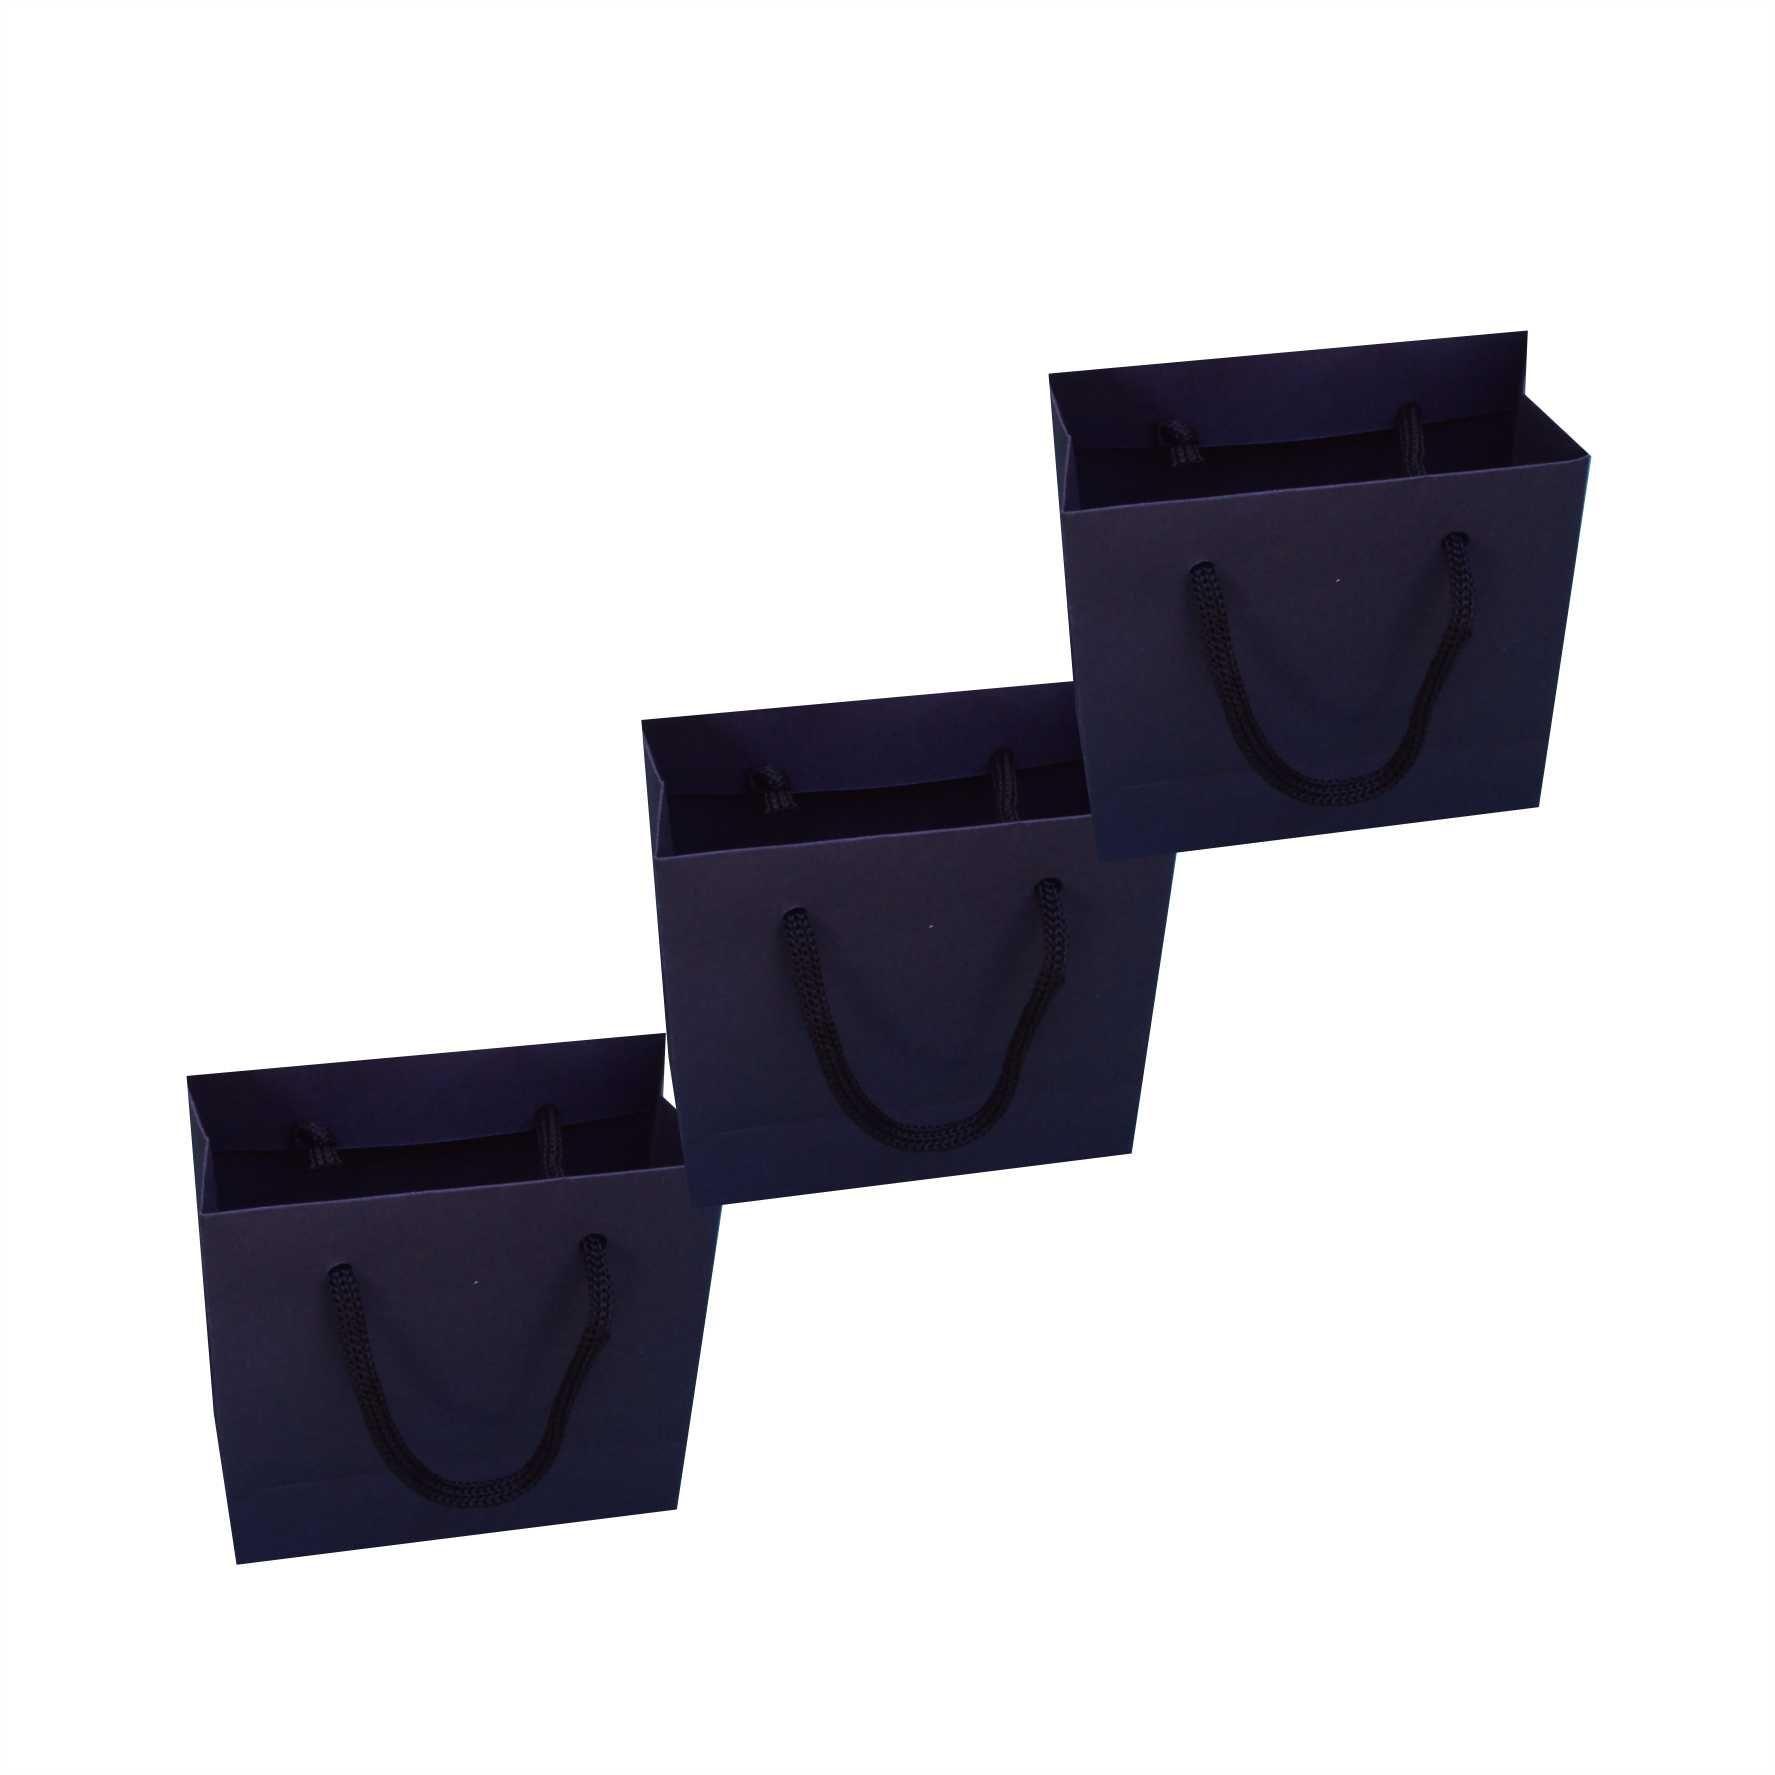 Sacola de papel mini (10x10x4,5 cm) - preta - 10 unidades